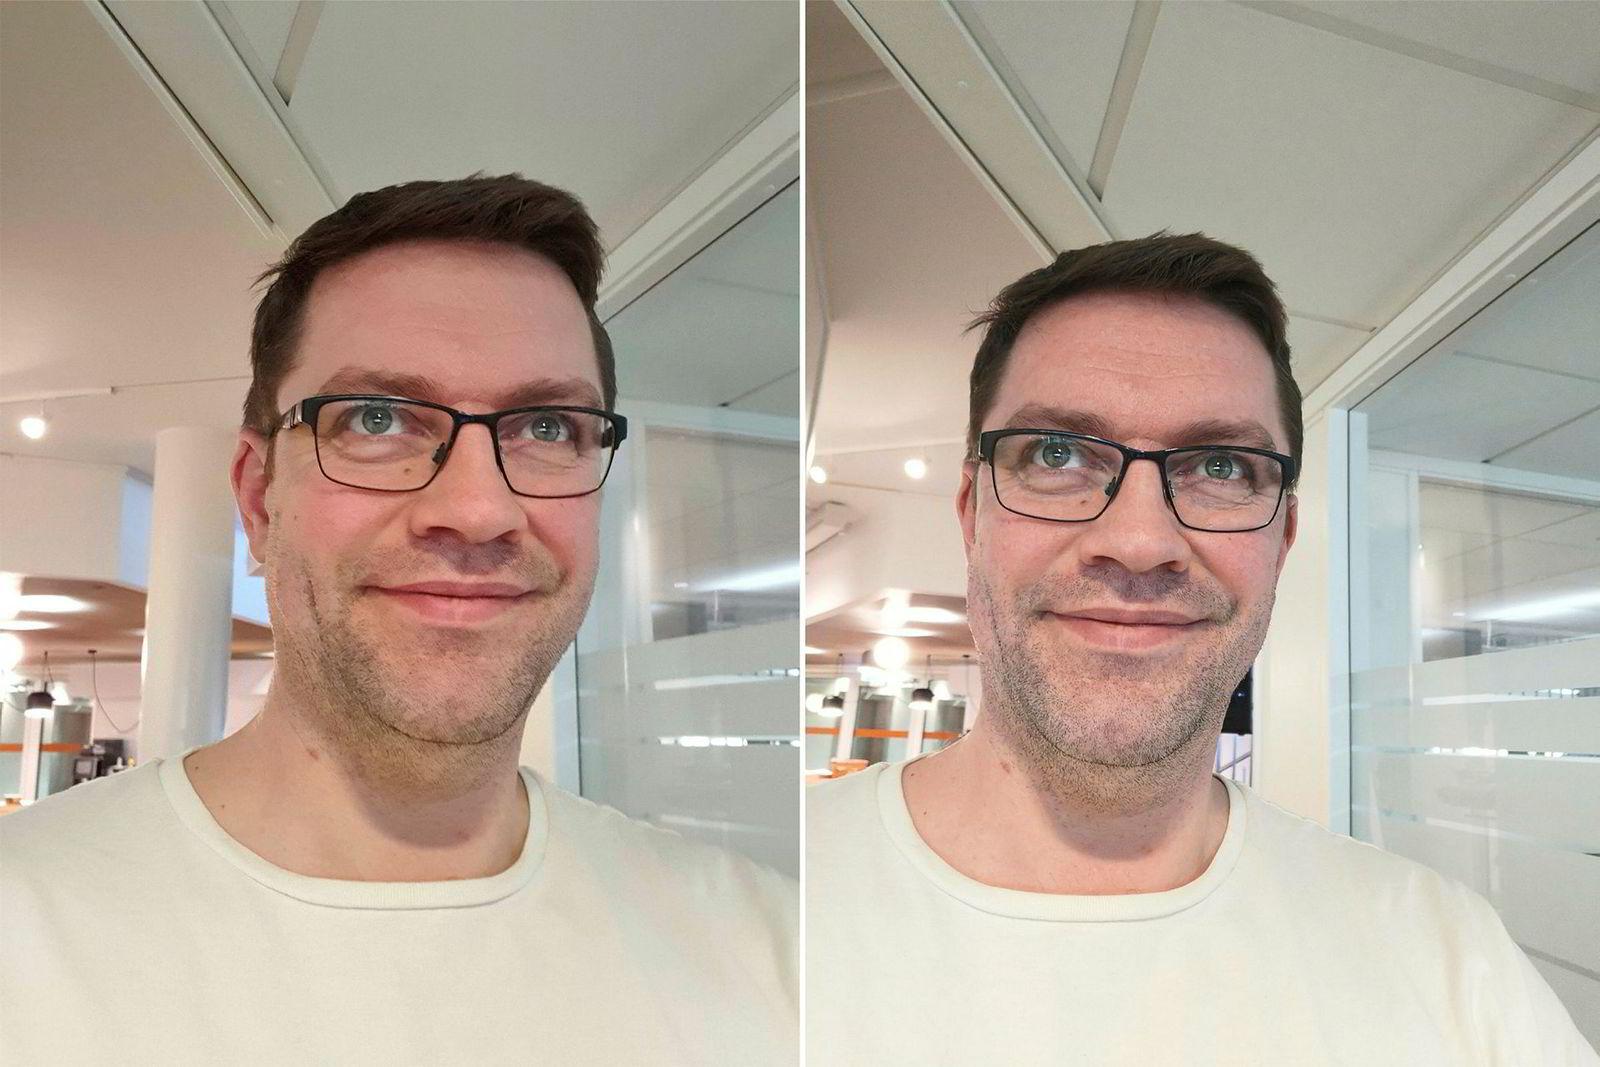 Selfie i godt lys, Galaxy S10+ til venstre, Mate 20 Pro til høyre.